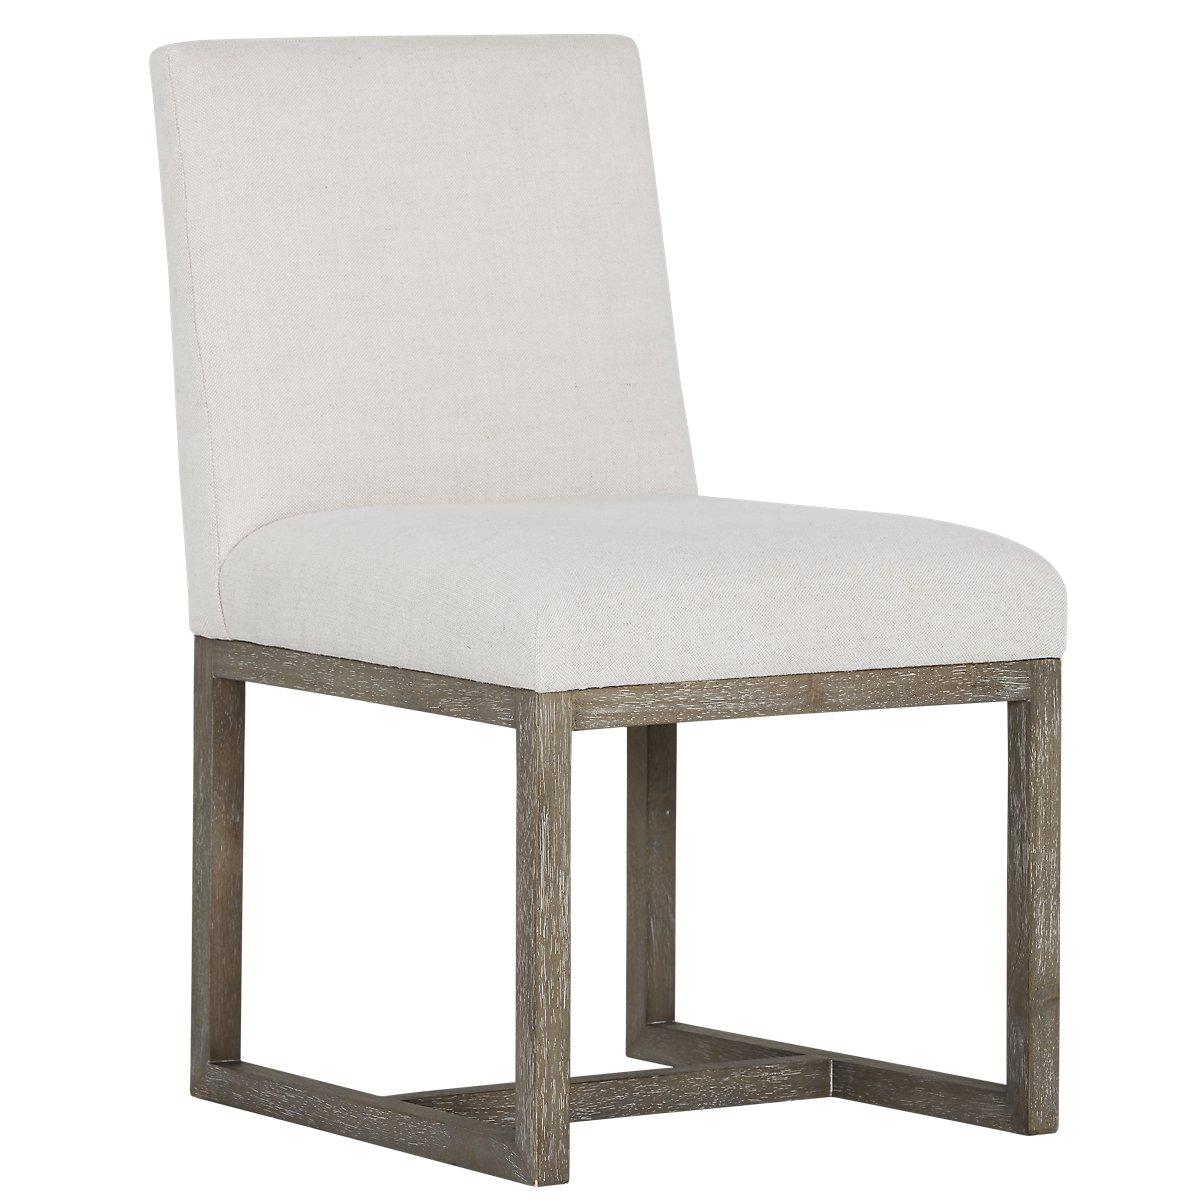 city furniture berlin white upholstered side chair. Black Bedroom Furniture Sets. Home Design Ideas